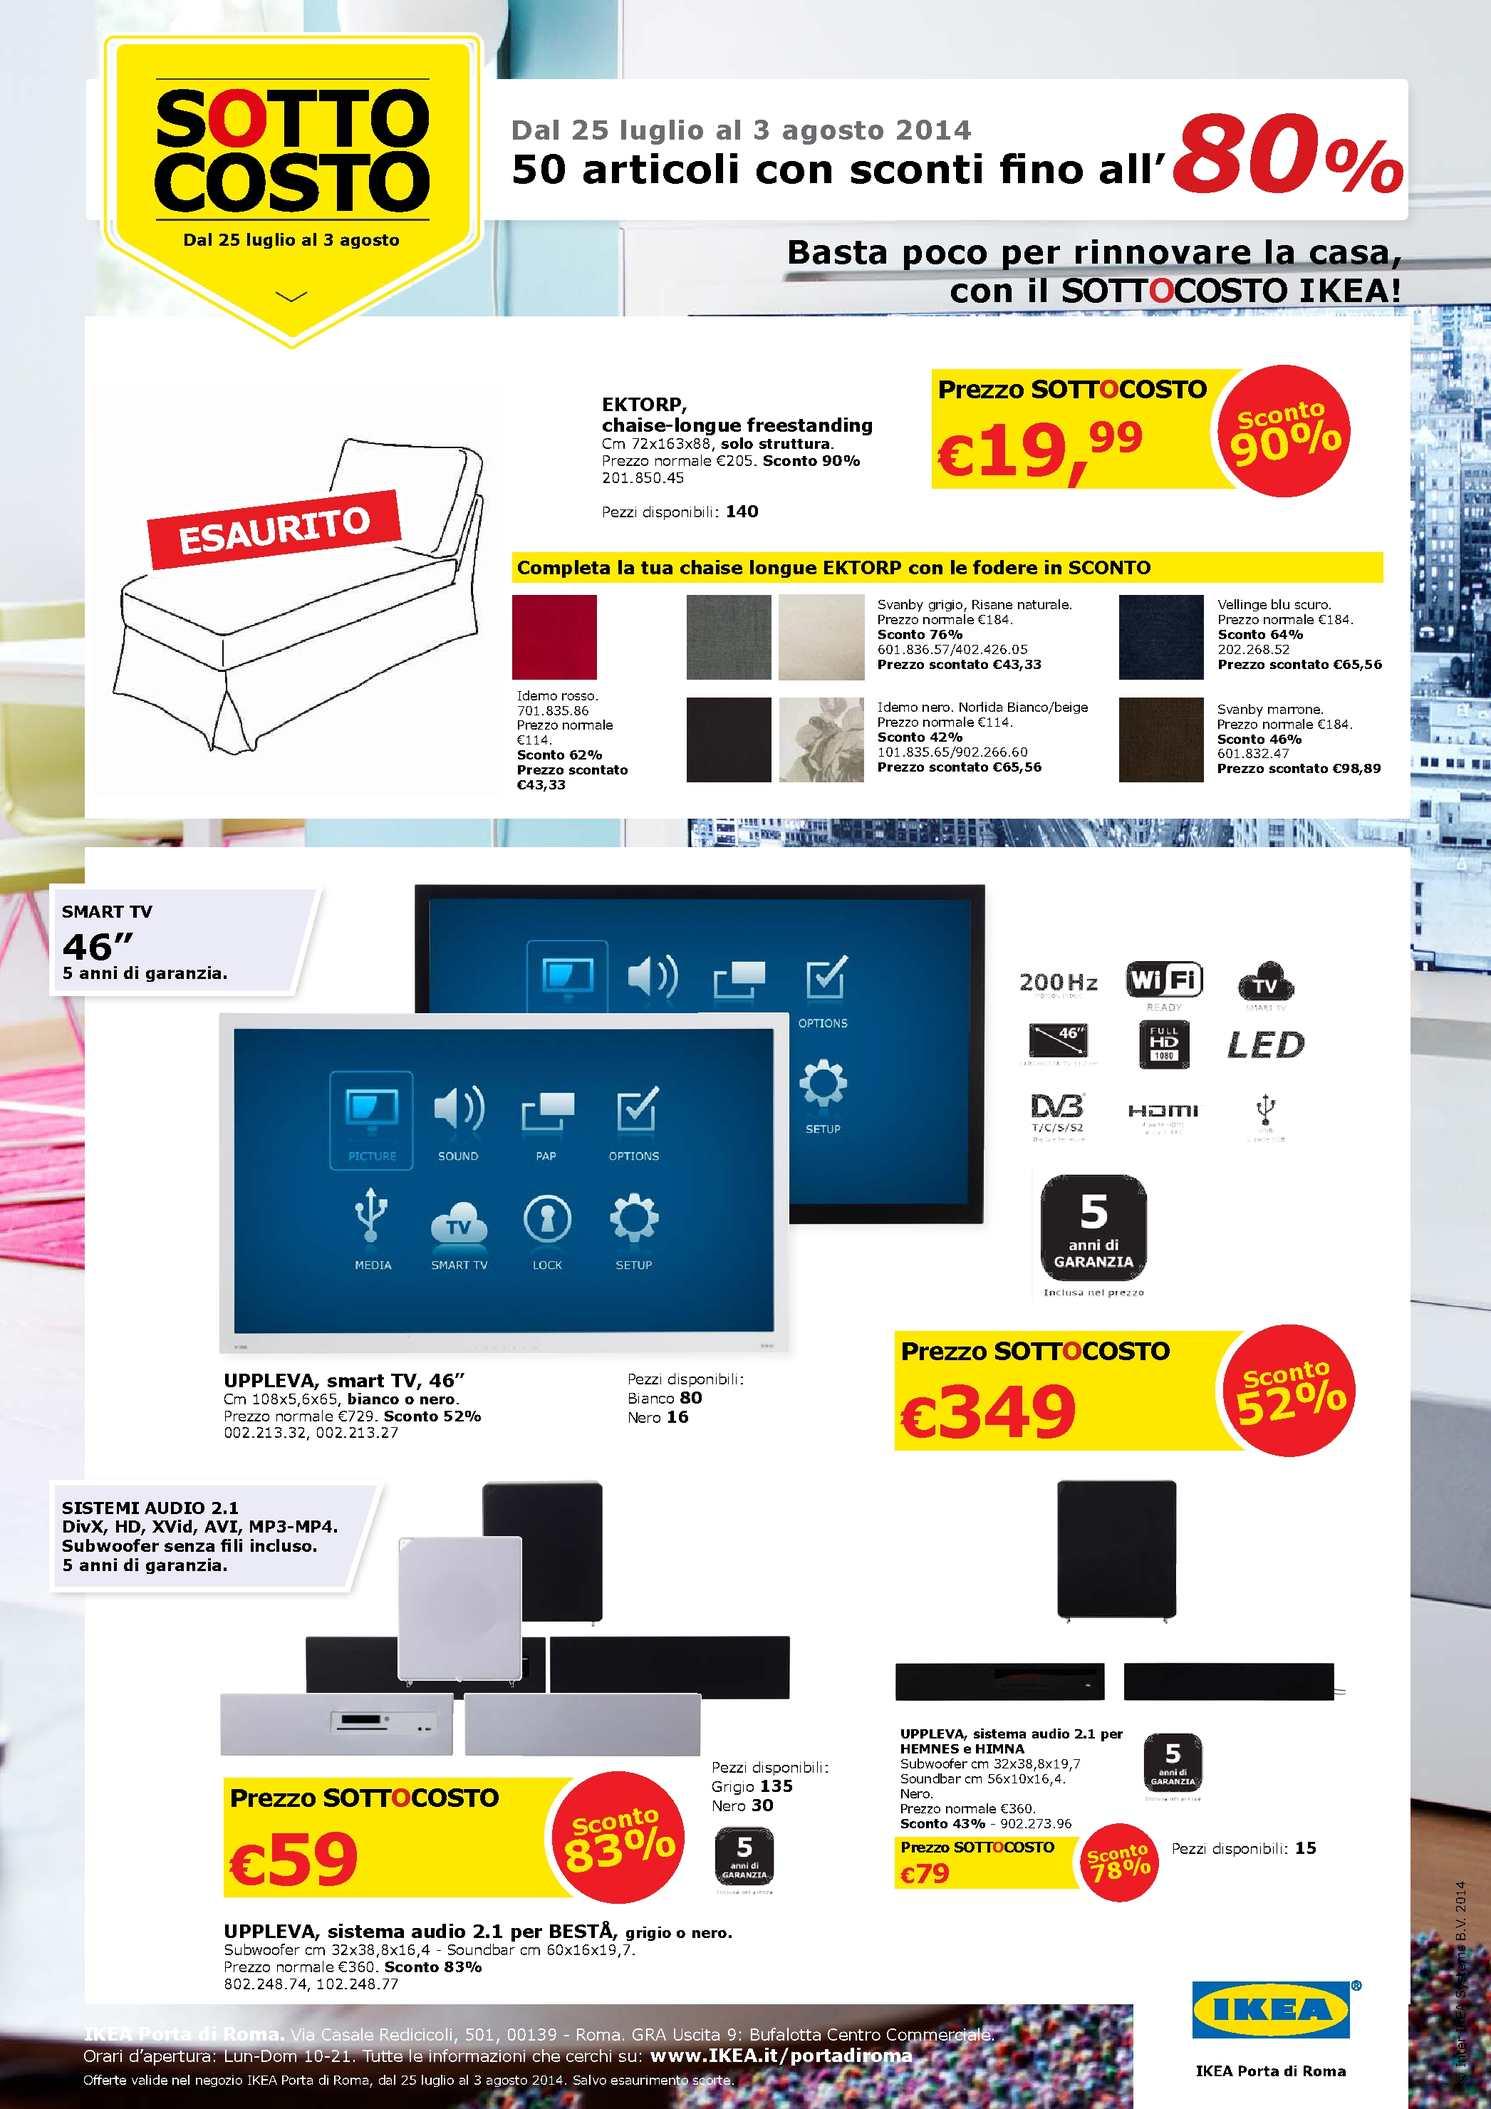 Calaméo Volantino Ikea Roma 25lug 3ago